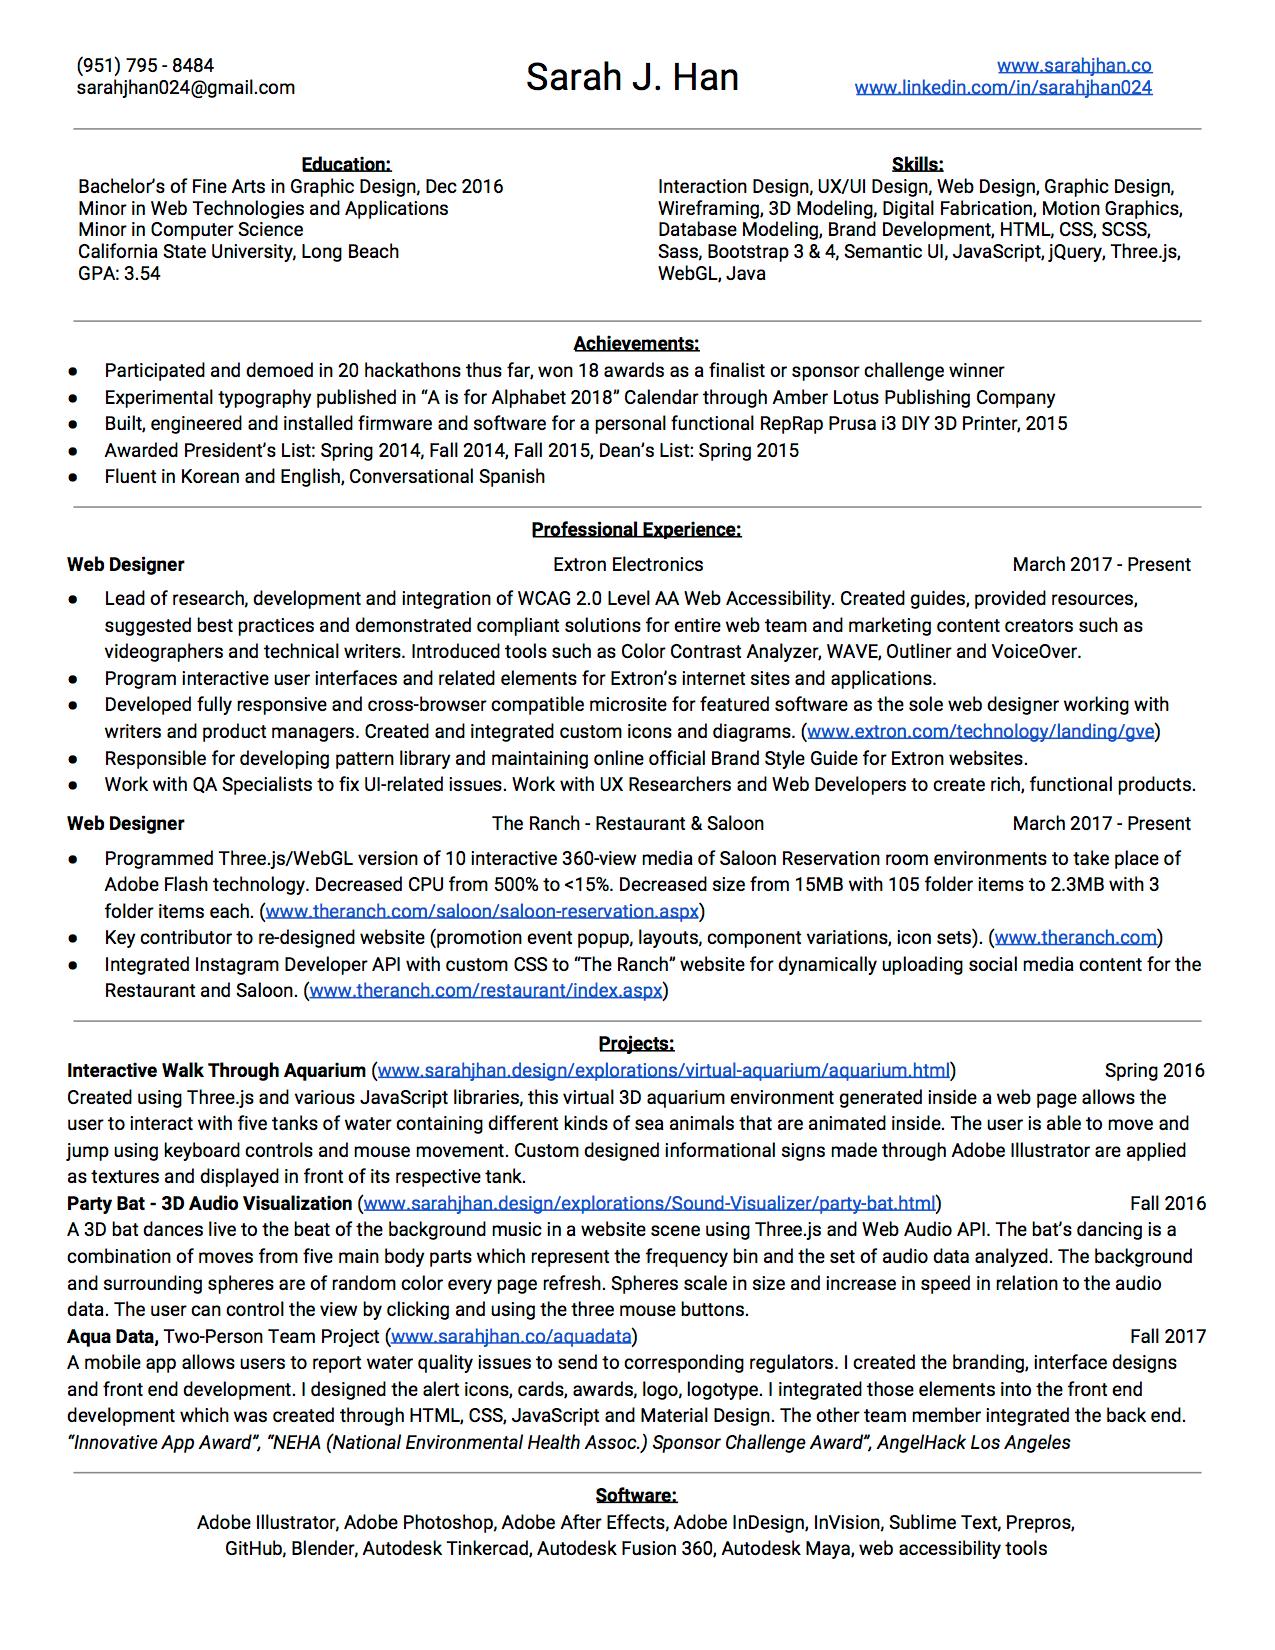 Sarah Han Portfolio Website - Resume